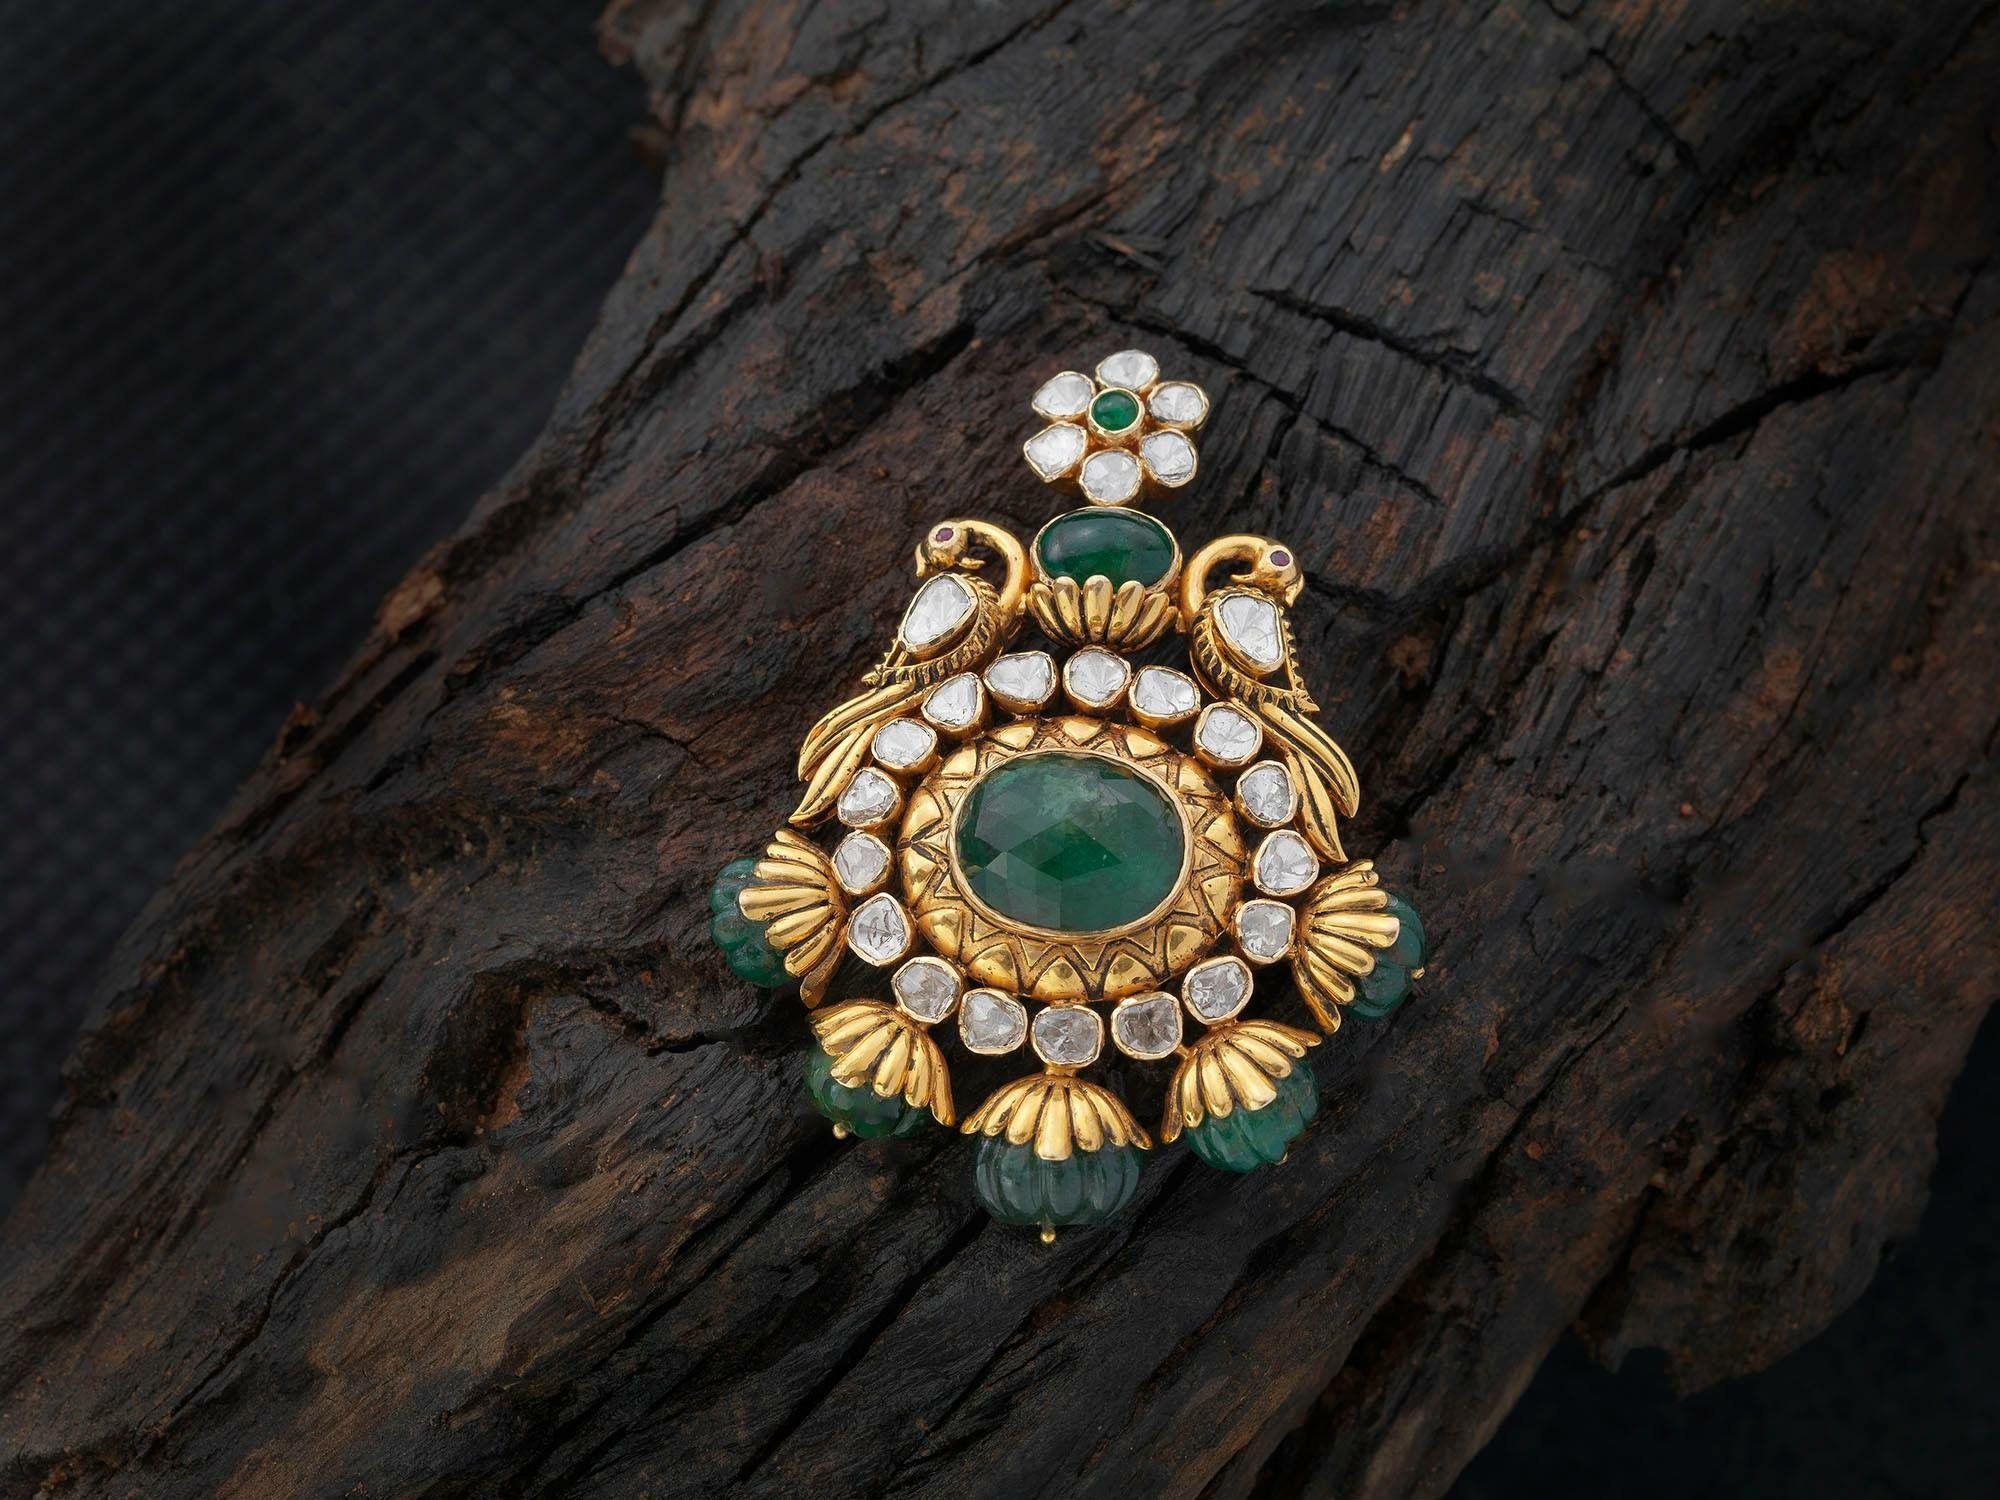 Pin by lakshmi suresh iyer on jewellery pinterest gold jewellery